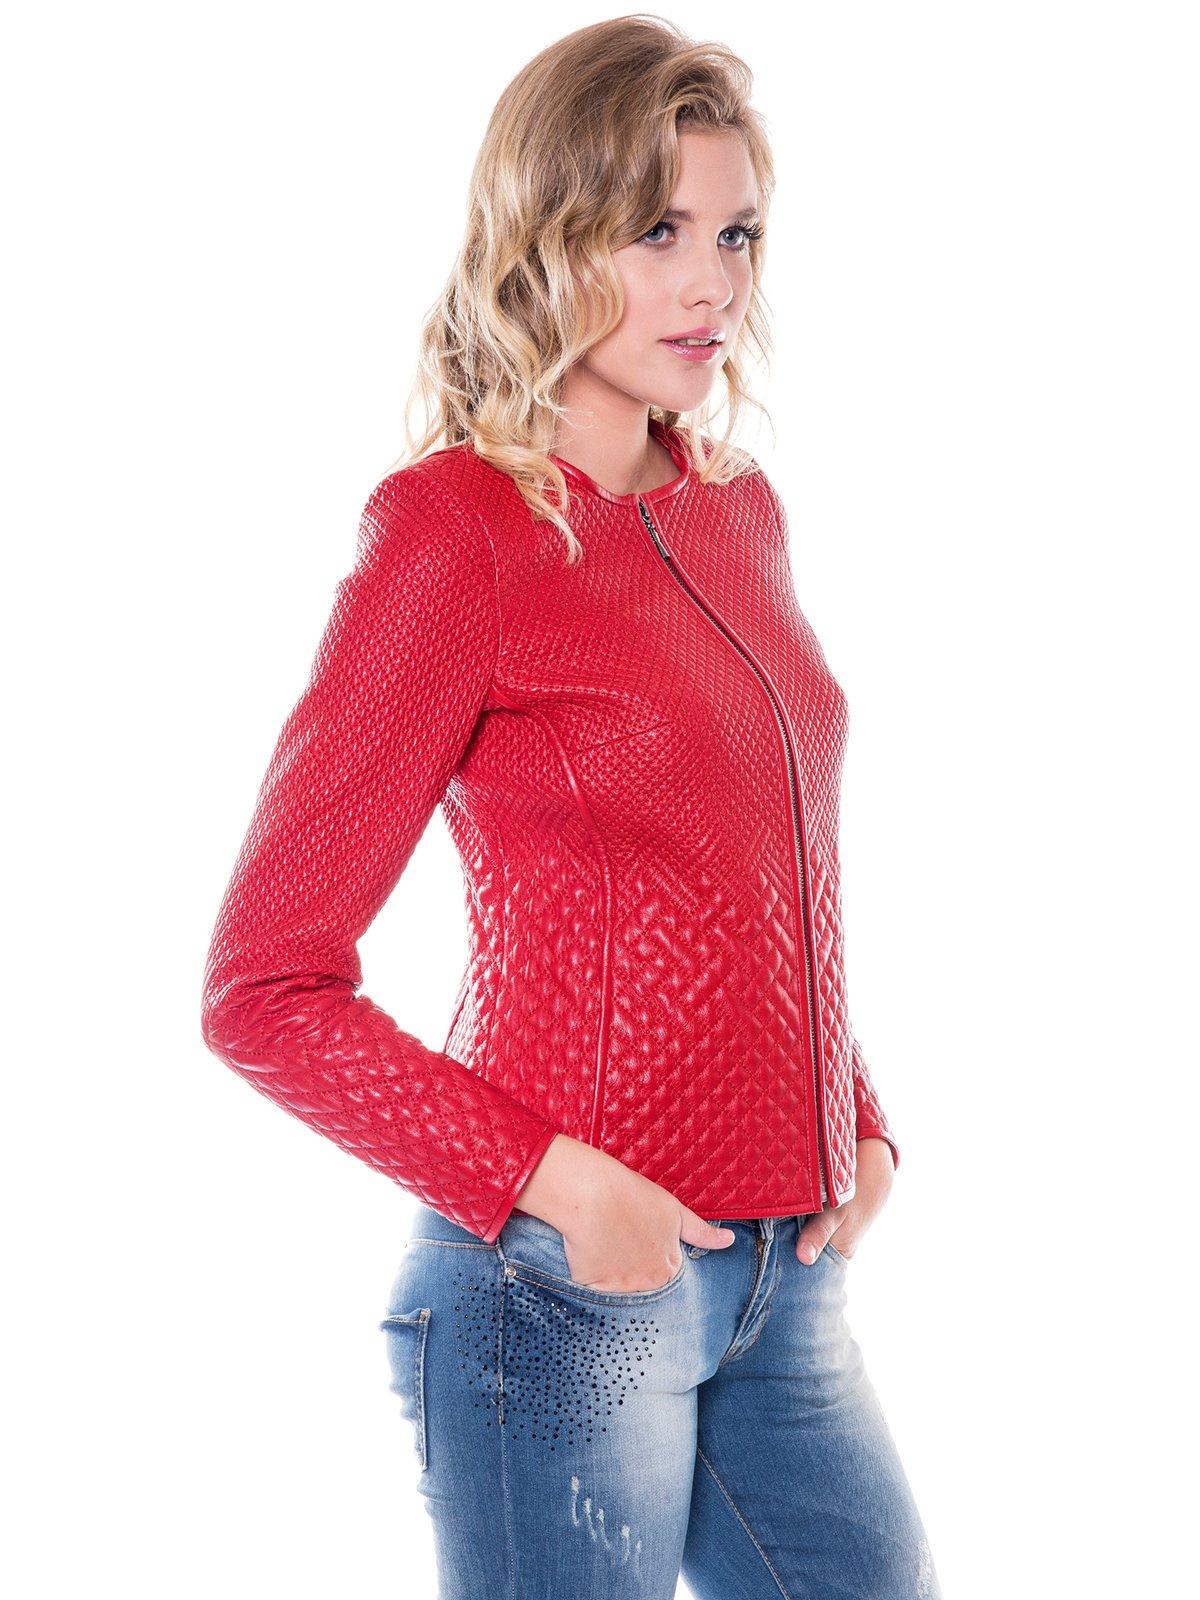 Куртка красная   2033764   фото 3